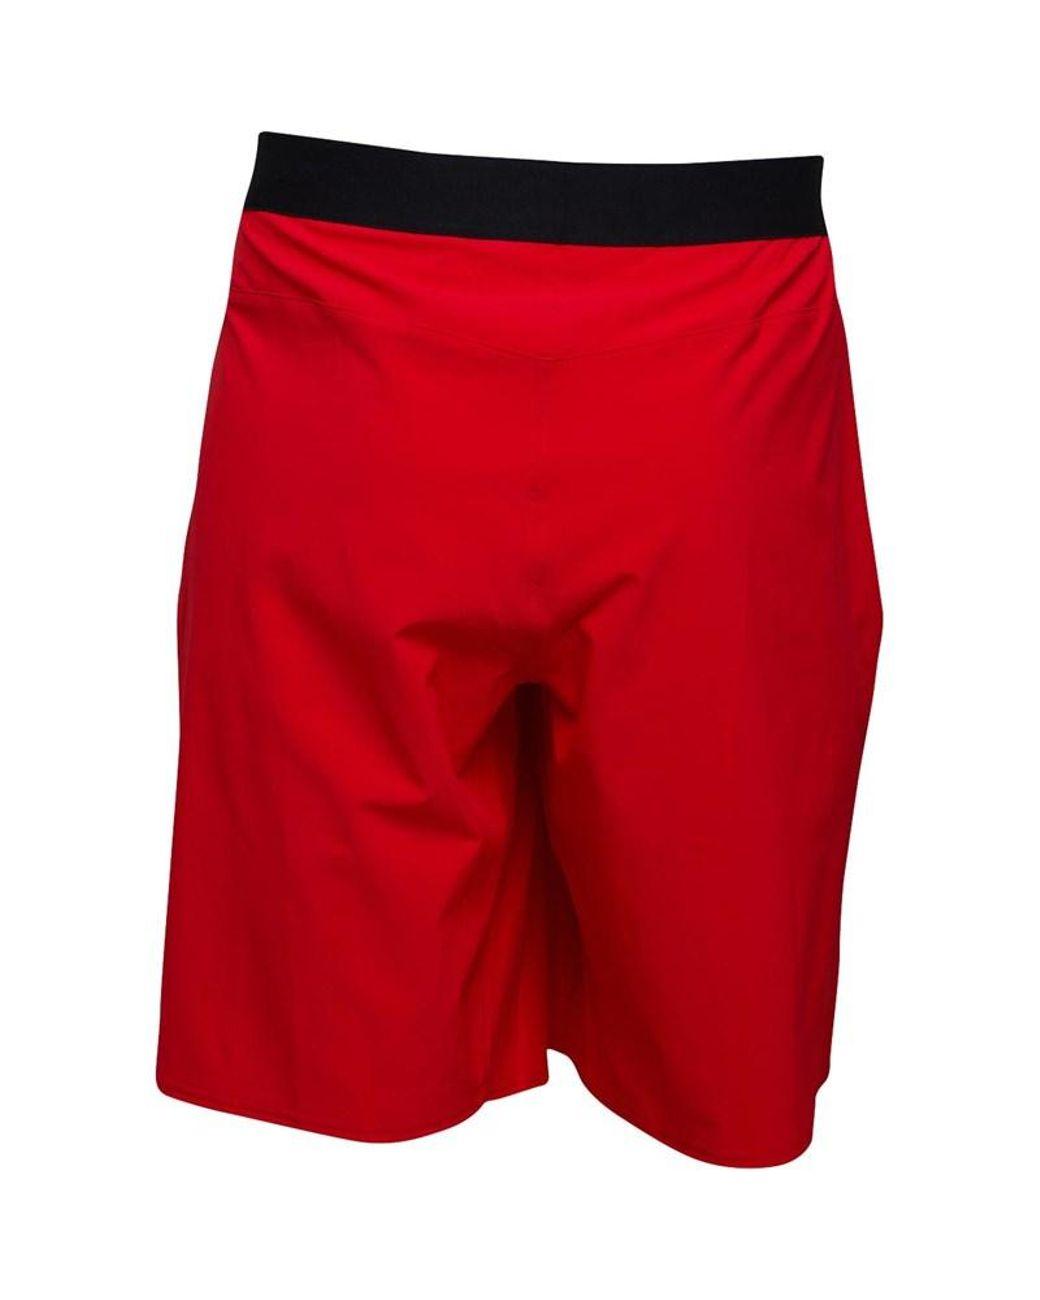 REEBOK Mens Shorts Soccer Tights Red Boxer Compression Crossfit L XL CD1220